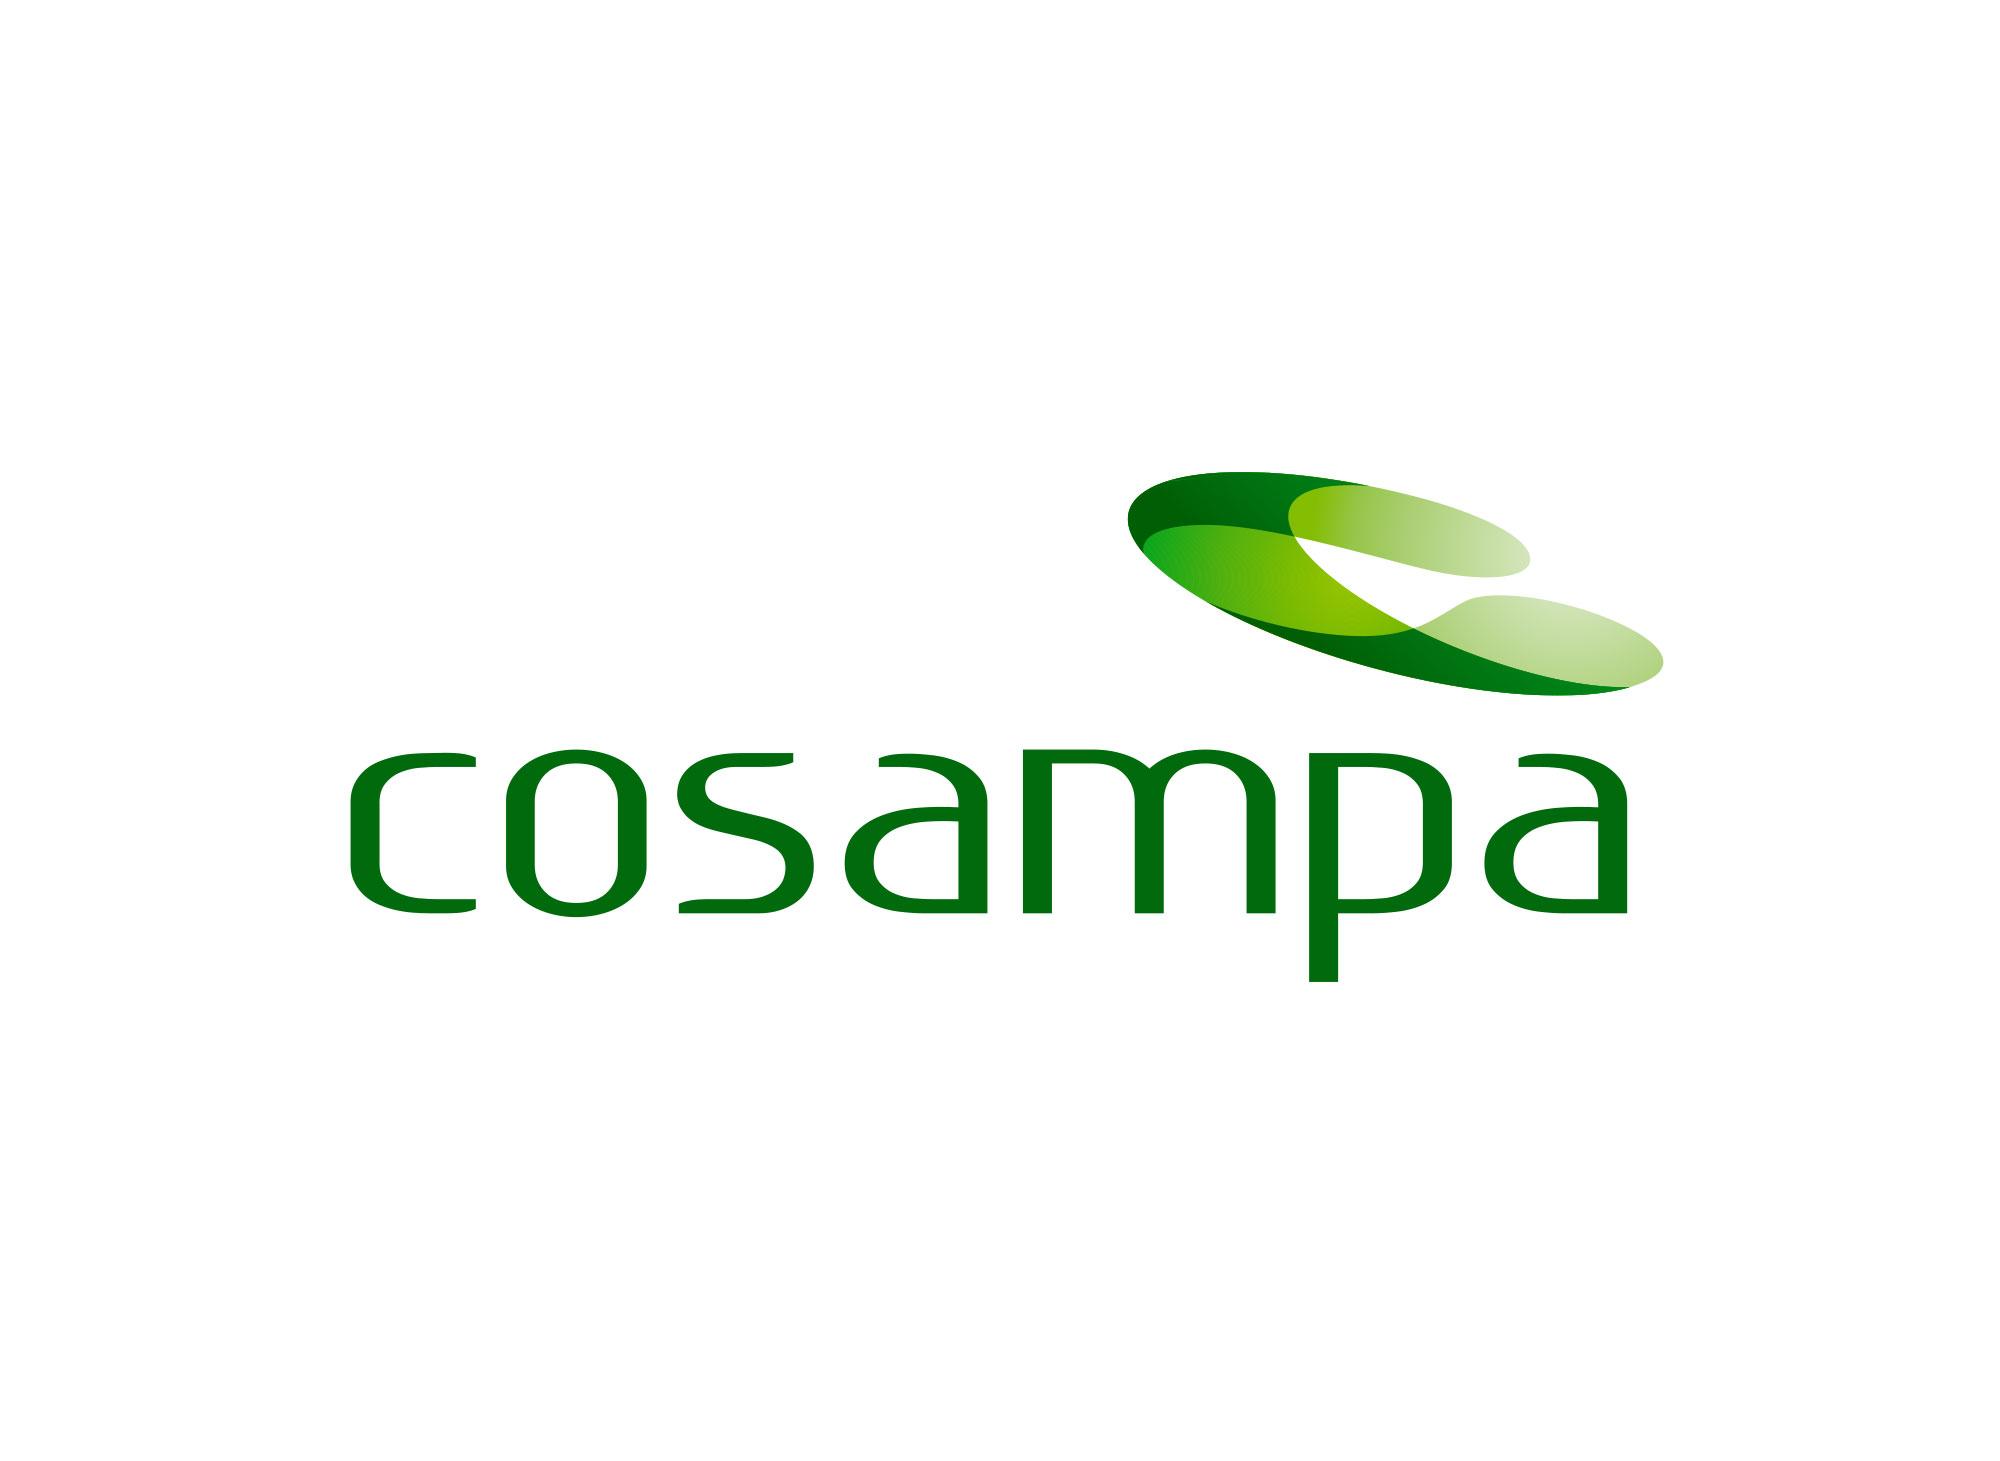 cosampa-cliente-portfolio-agencia-diretriz-digital-marketing-fortaleza